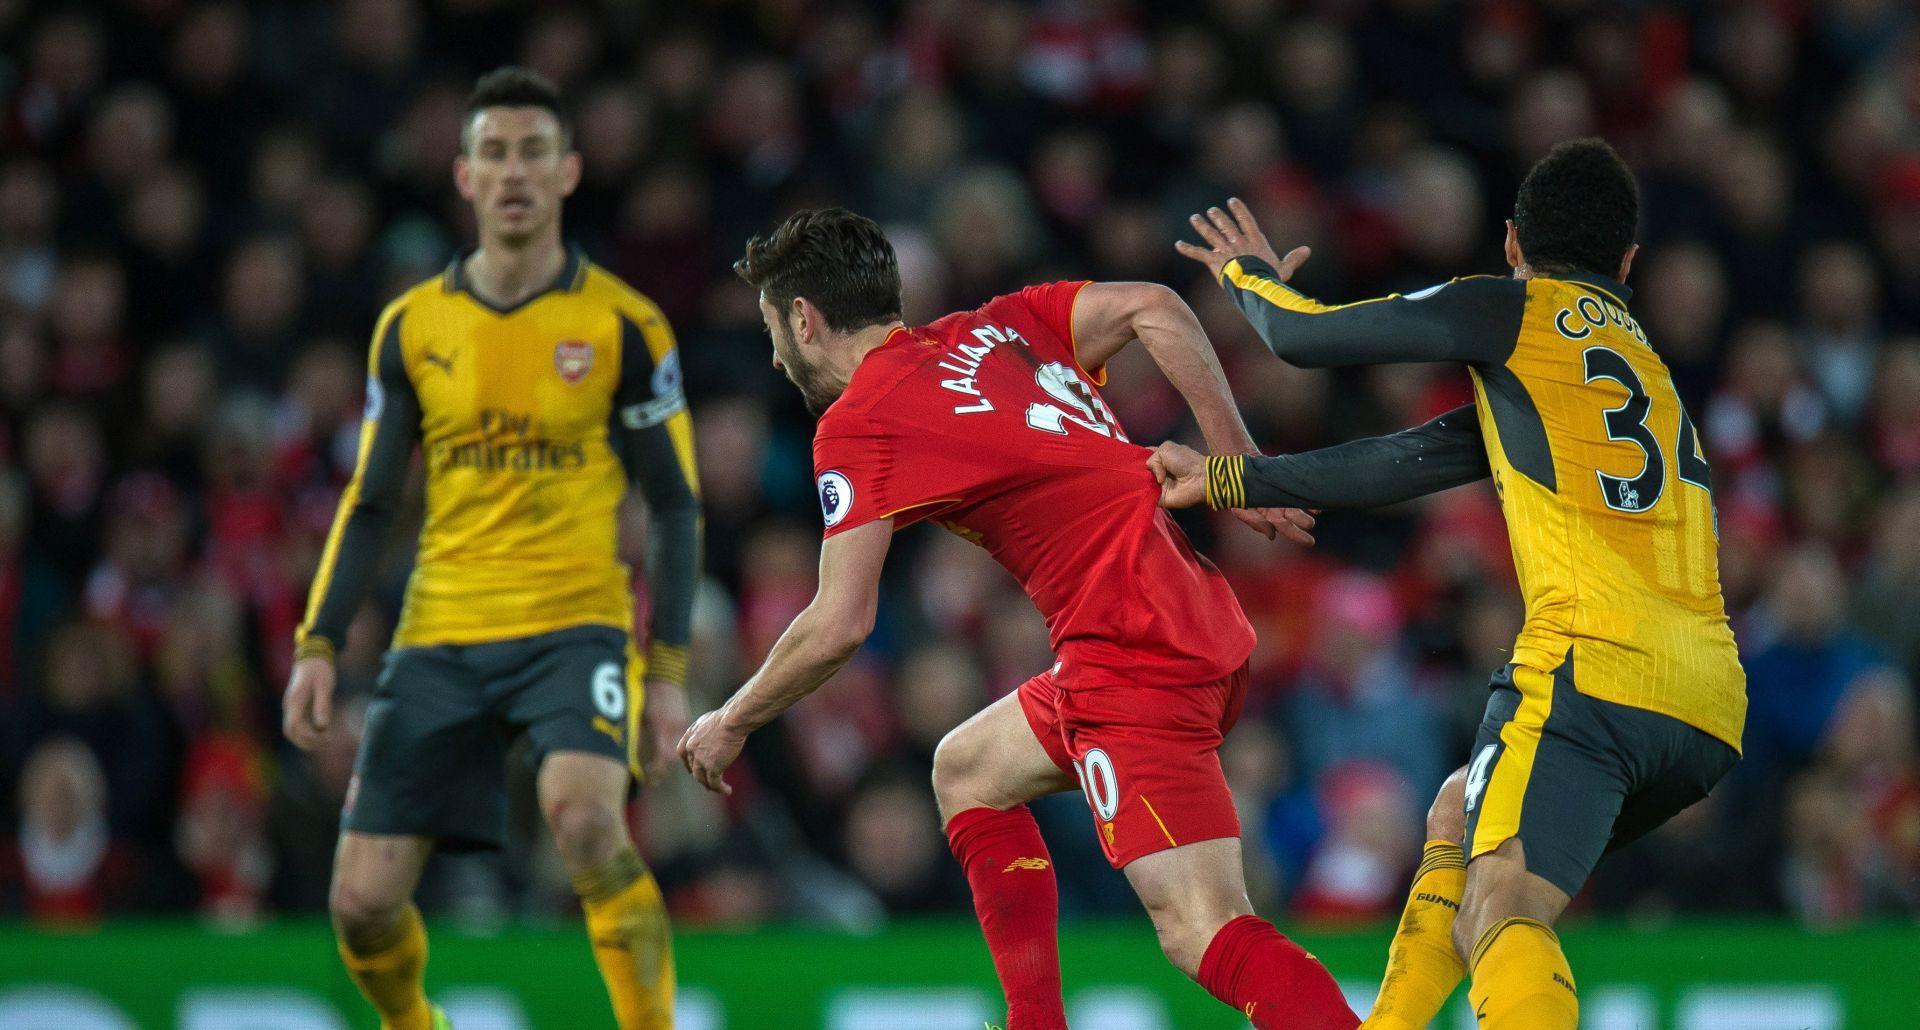 PREMIERLIGA Liverpool na Anfieldu svladao Arsnal